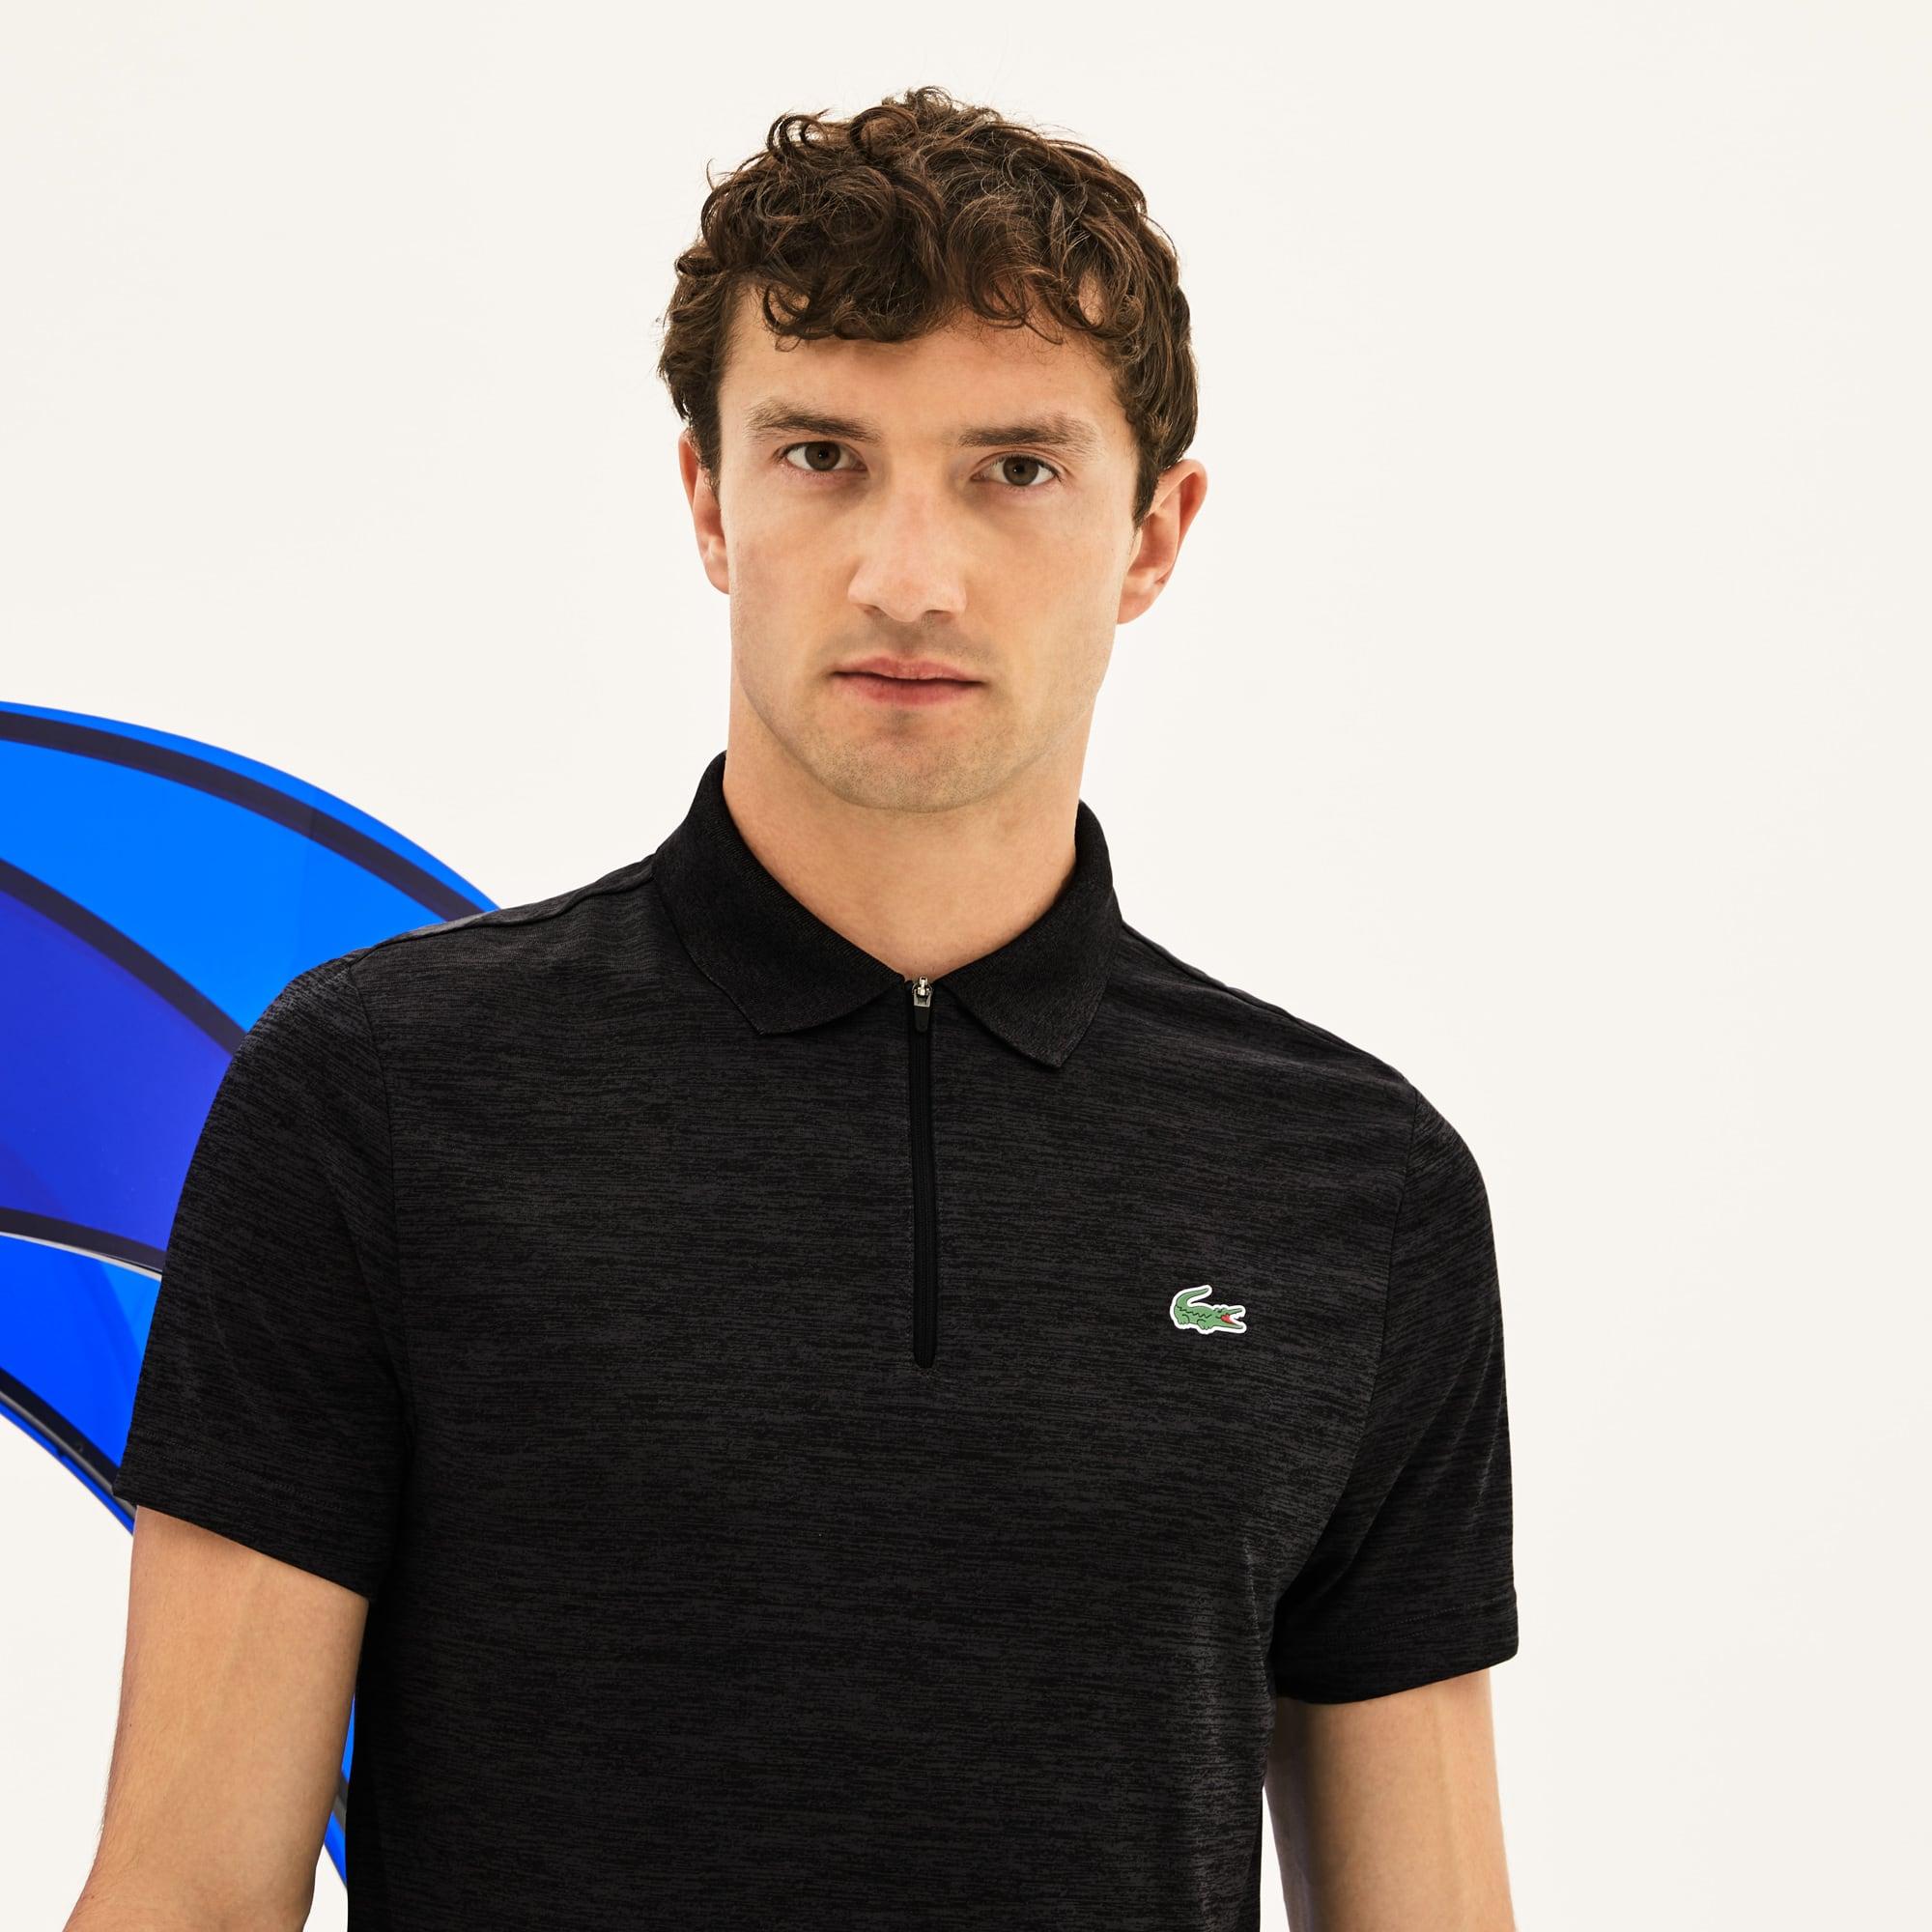 Polo De Hombre Lacoste SPORT Novak Djokovic-Off Court Collection En Tejido De Punto Técnico Jaspeado